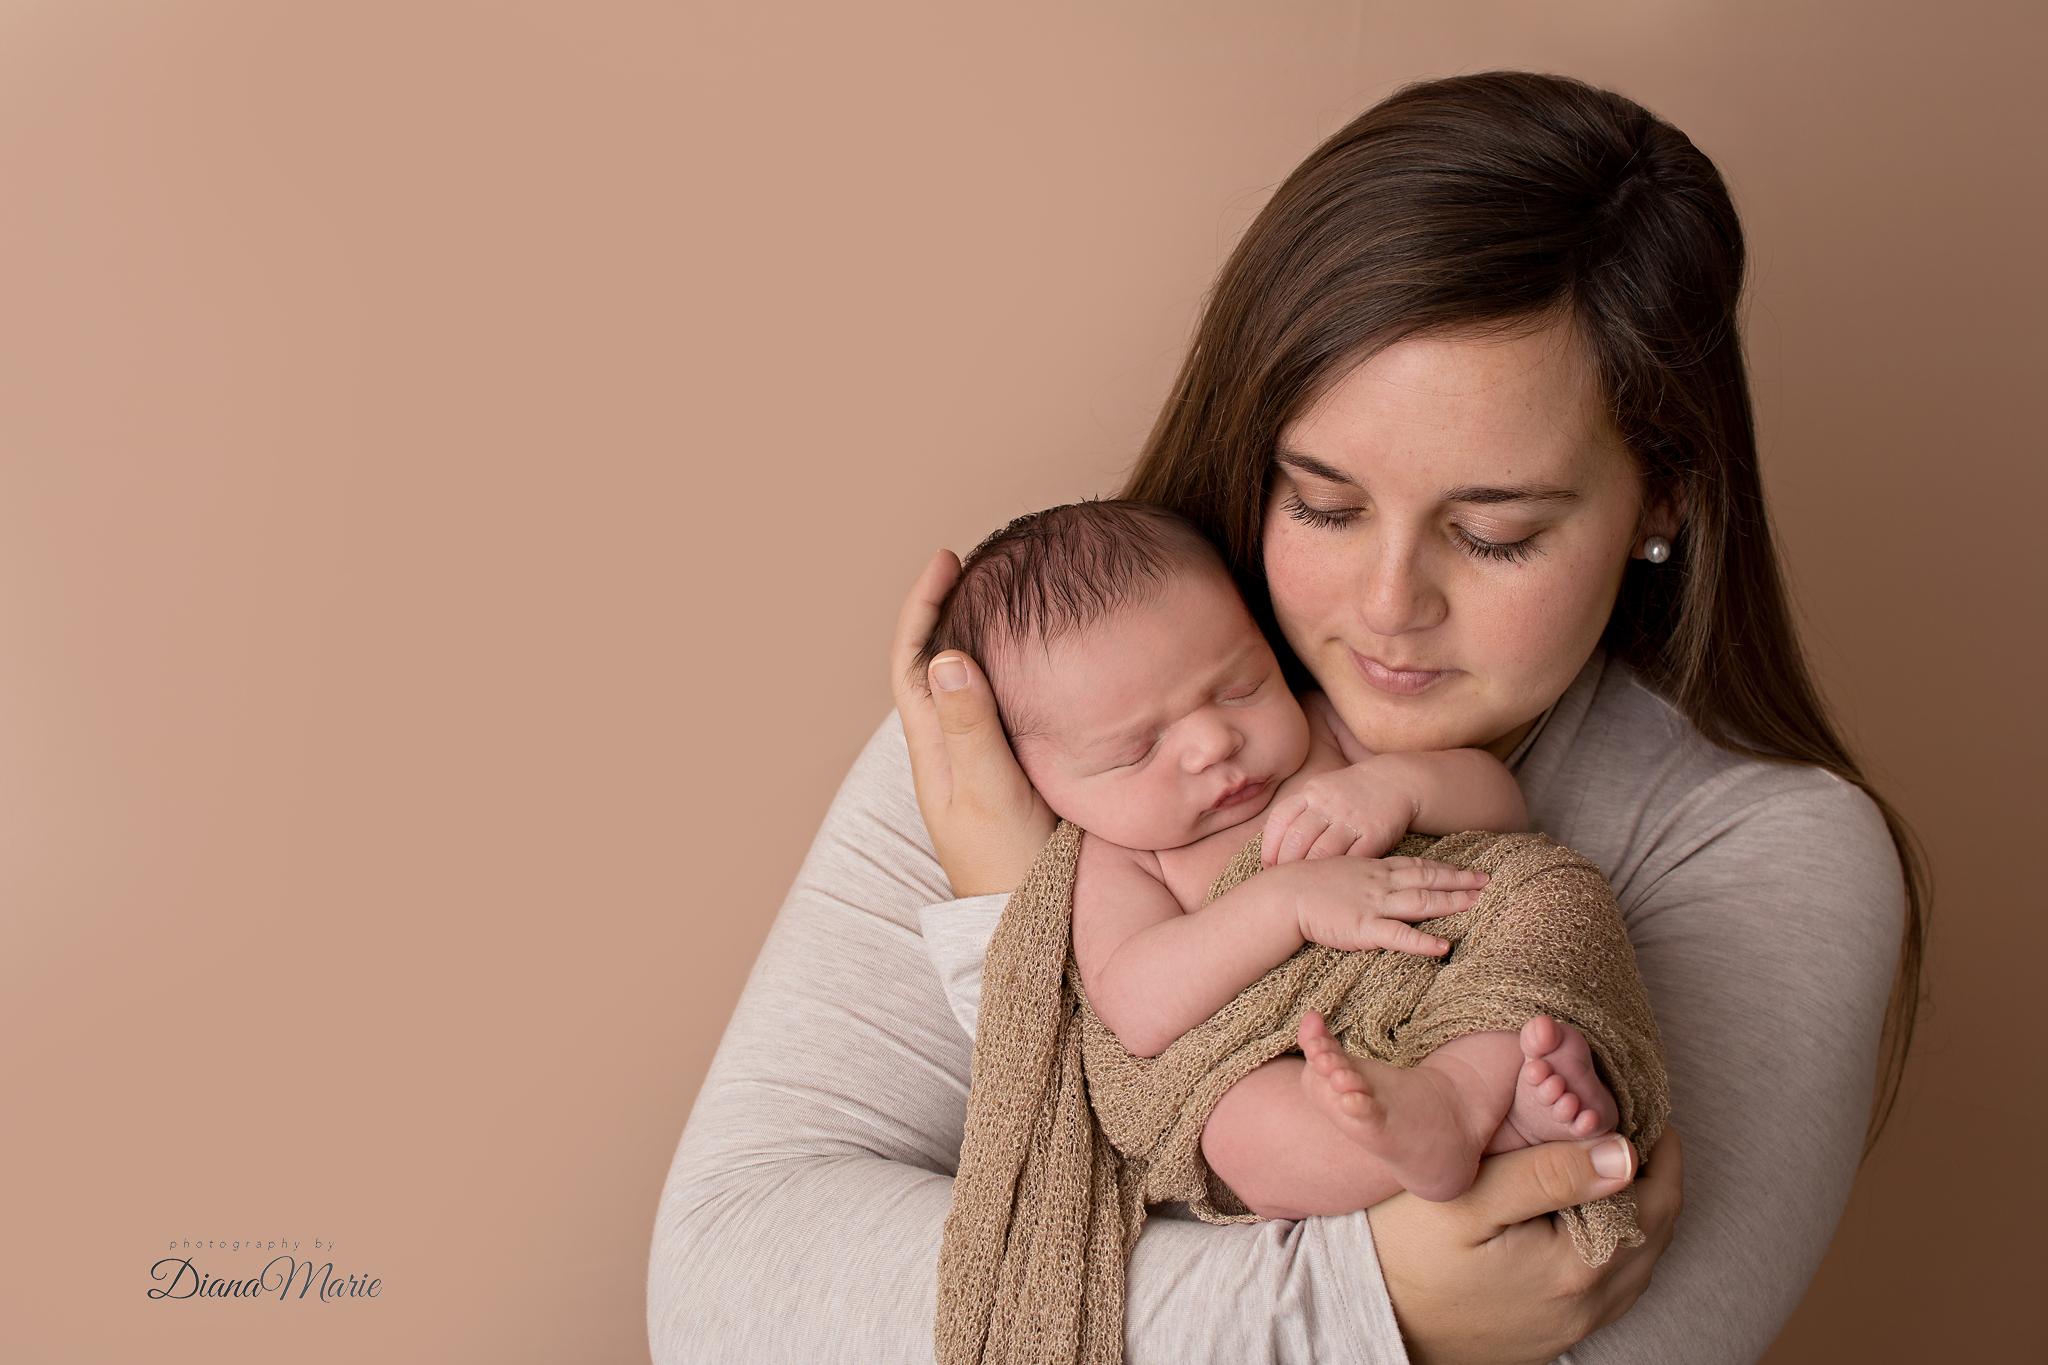 Titling/Alt Text/Description: 1. newborn photography jacksonville 2. mom and baby 3. saint augustine newborn photography 4. newborn photographer 5. baby 6. neutral colors newborn 7. Jacksonville photographer